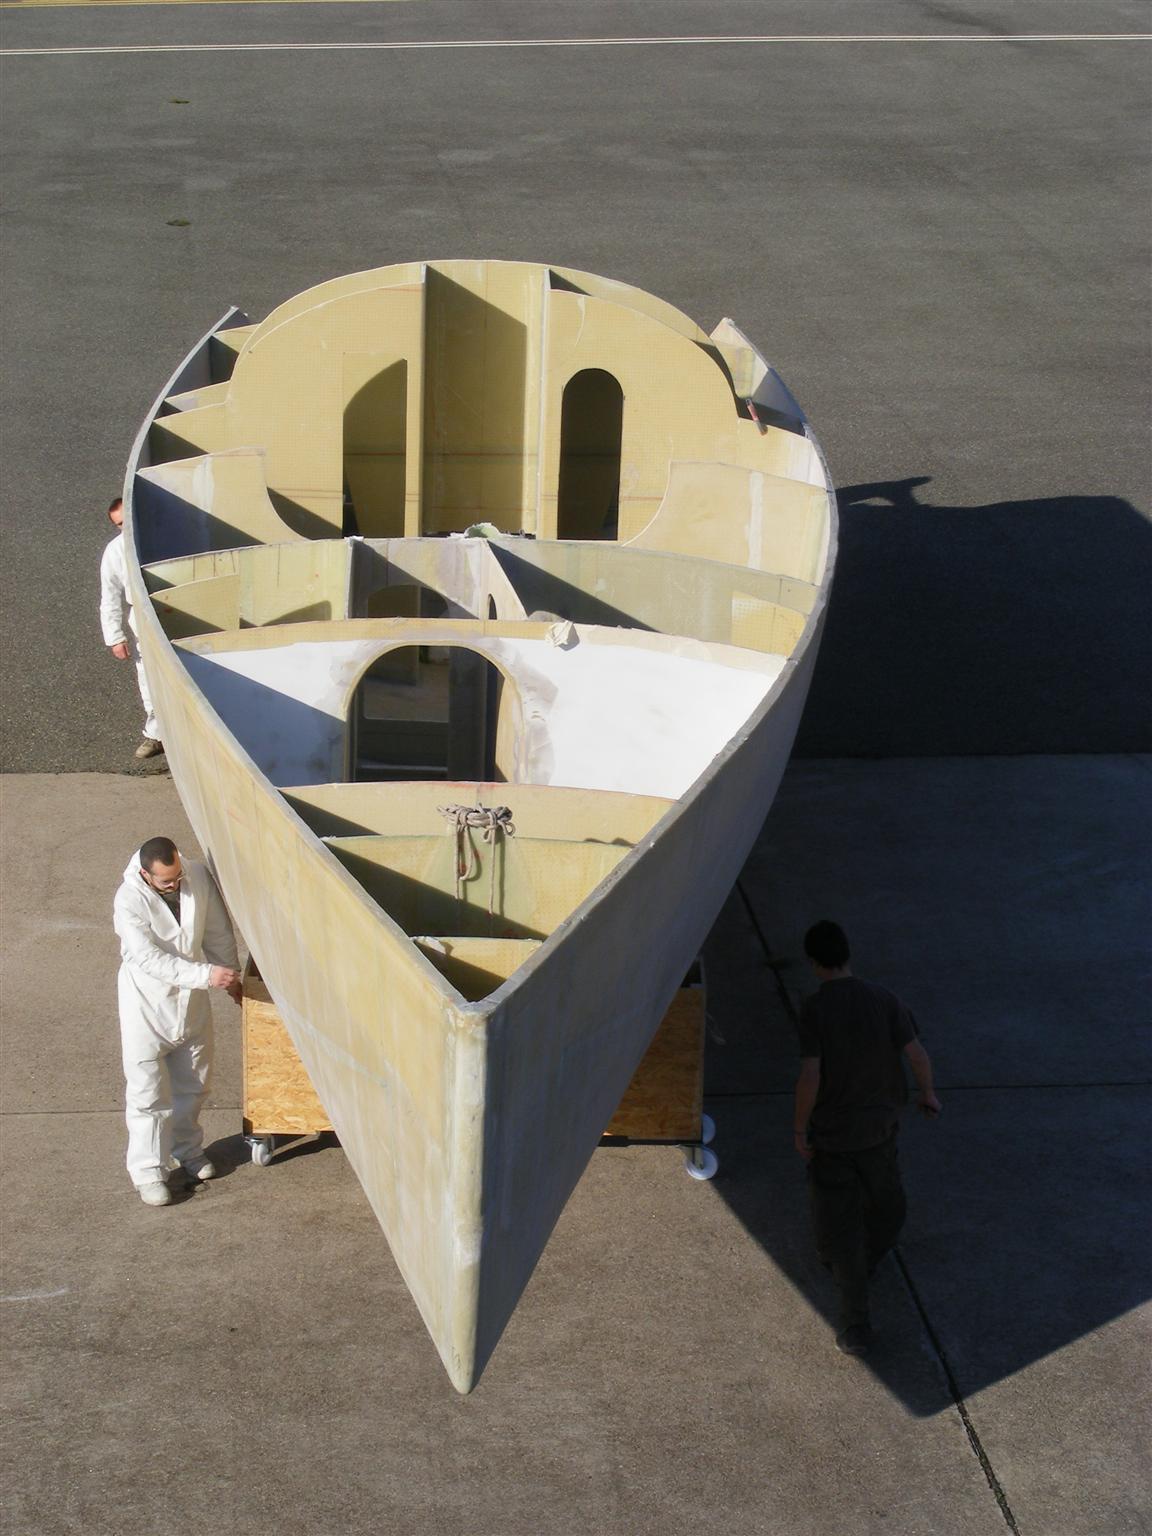 bain de soleil pour la coque the hull takes the sun. Black Bedroom Furniture Sets. Home Design Ideas